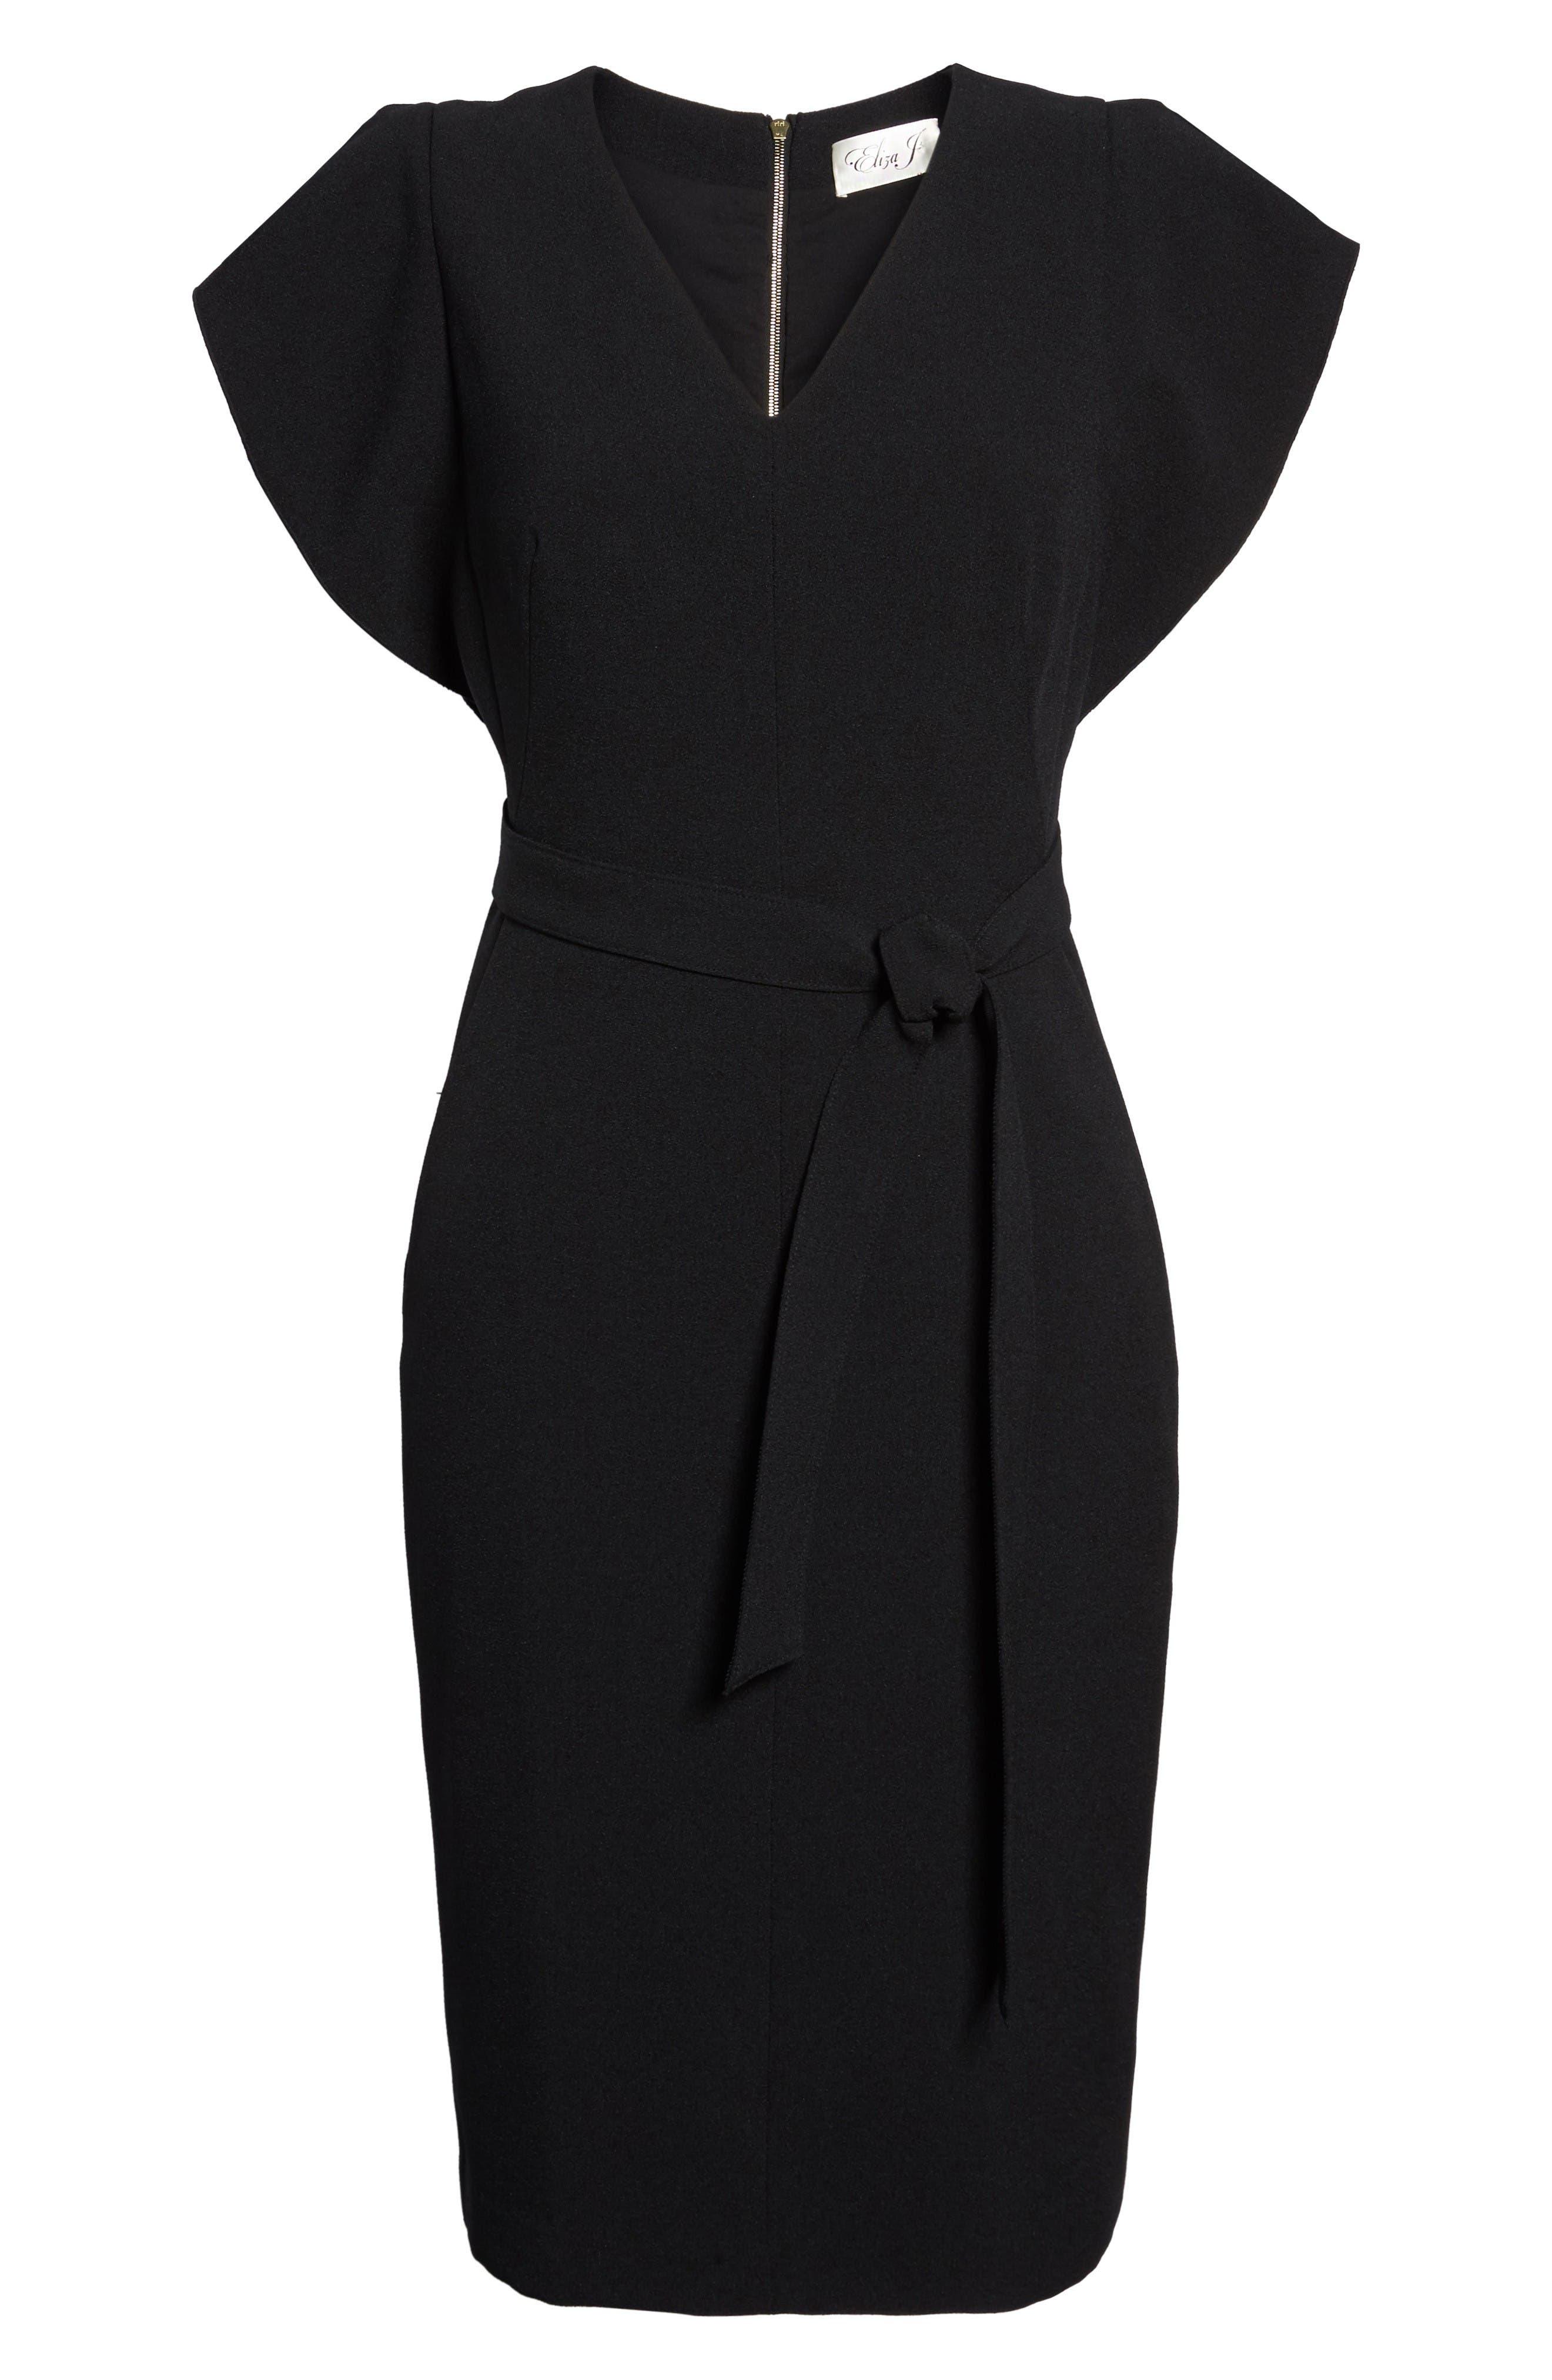 Ruffle Sleeve Sheath Dress,                             Alternate thumbnail 8, color,                             Black